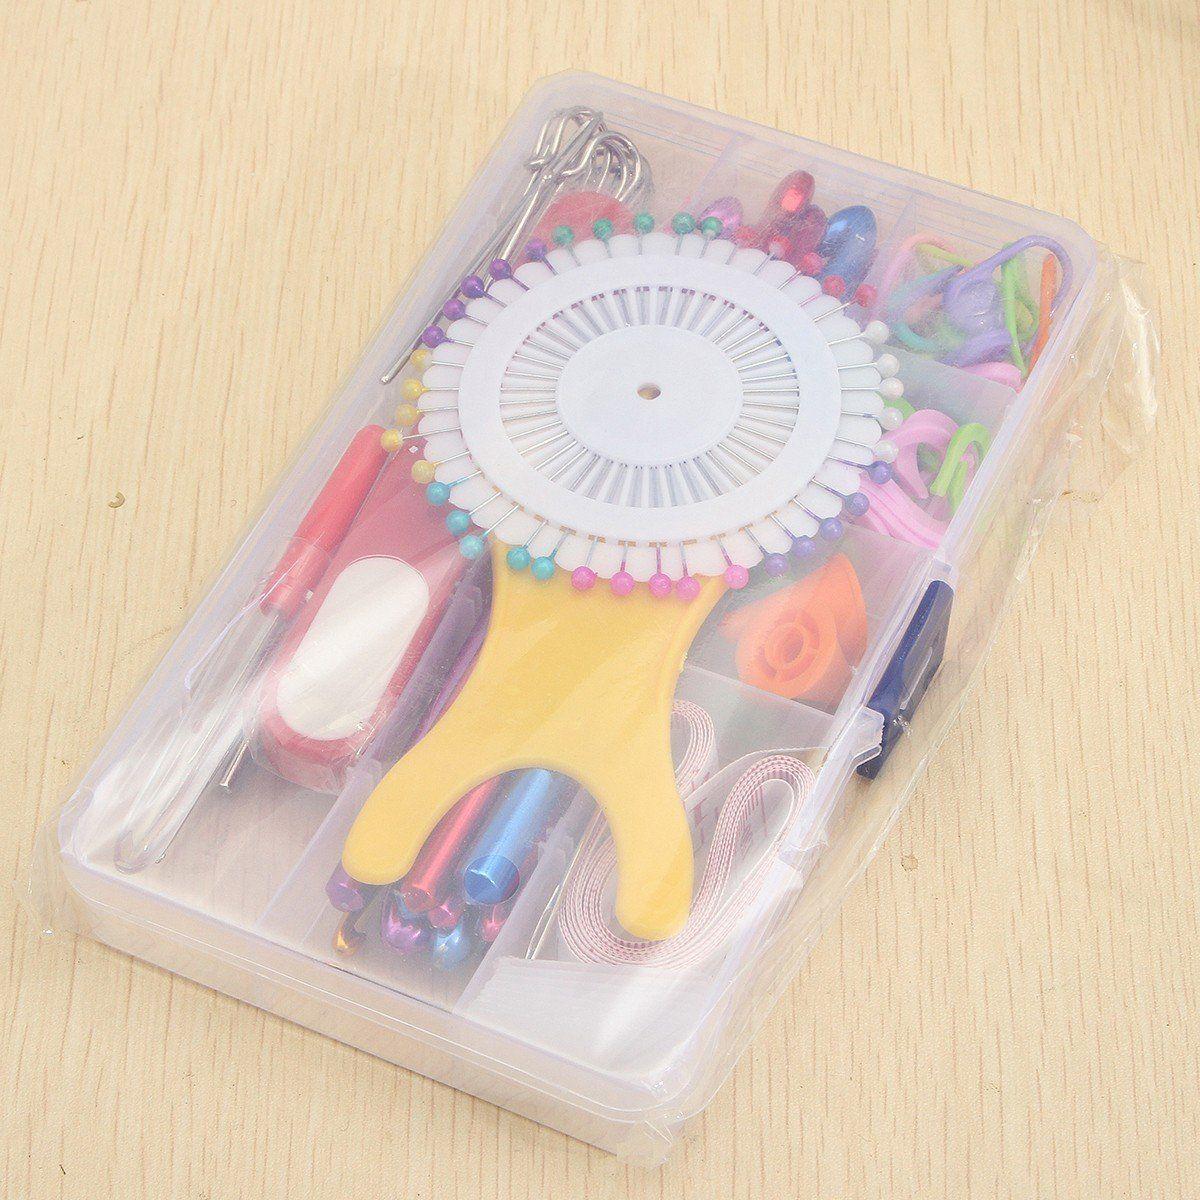 Set of 10 Multi Colour Soft Grip Handle Aluminum Crochet Hooks Knitting Needles